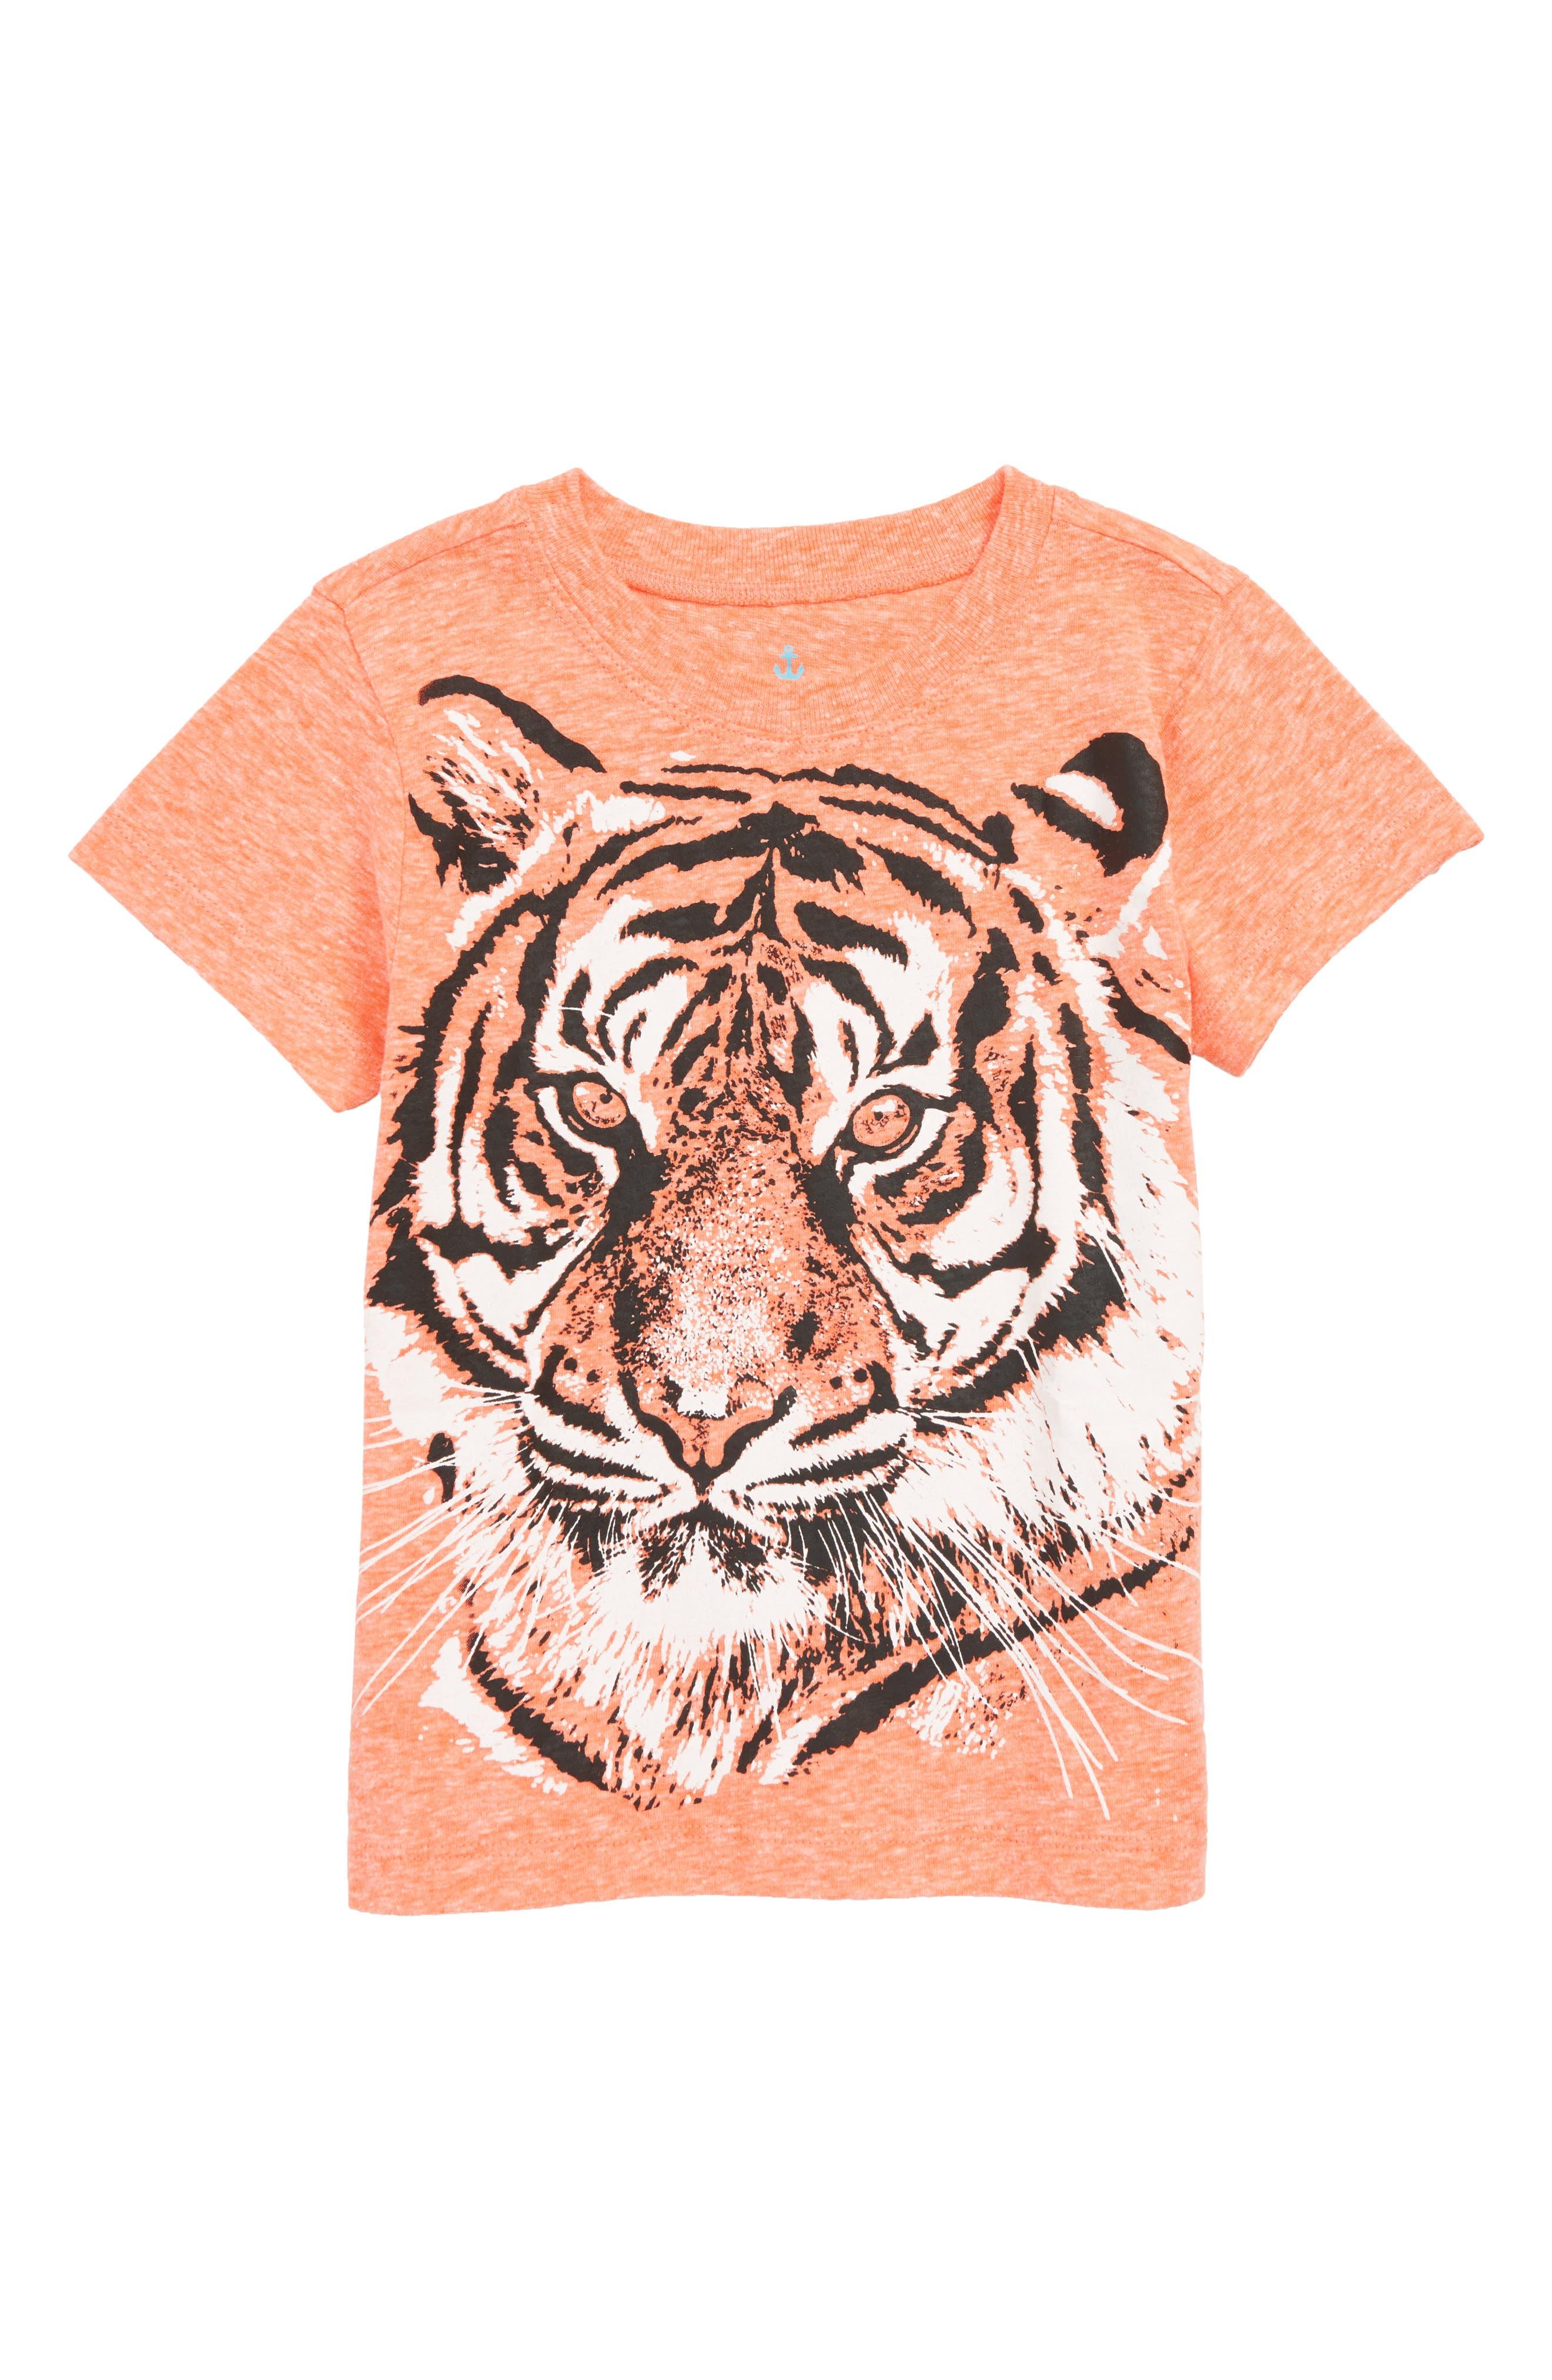 CREWCUTS BY J.CREW,                             Tiger T-Shirt,                             Main thumbnail 1, color,                             SWEET MELON